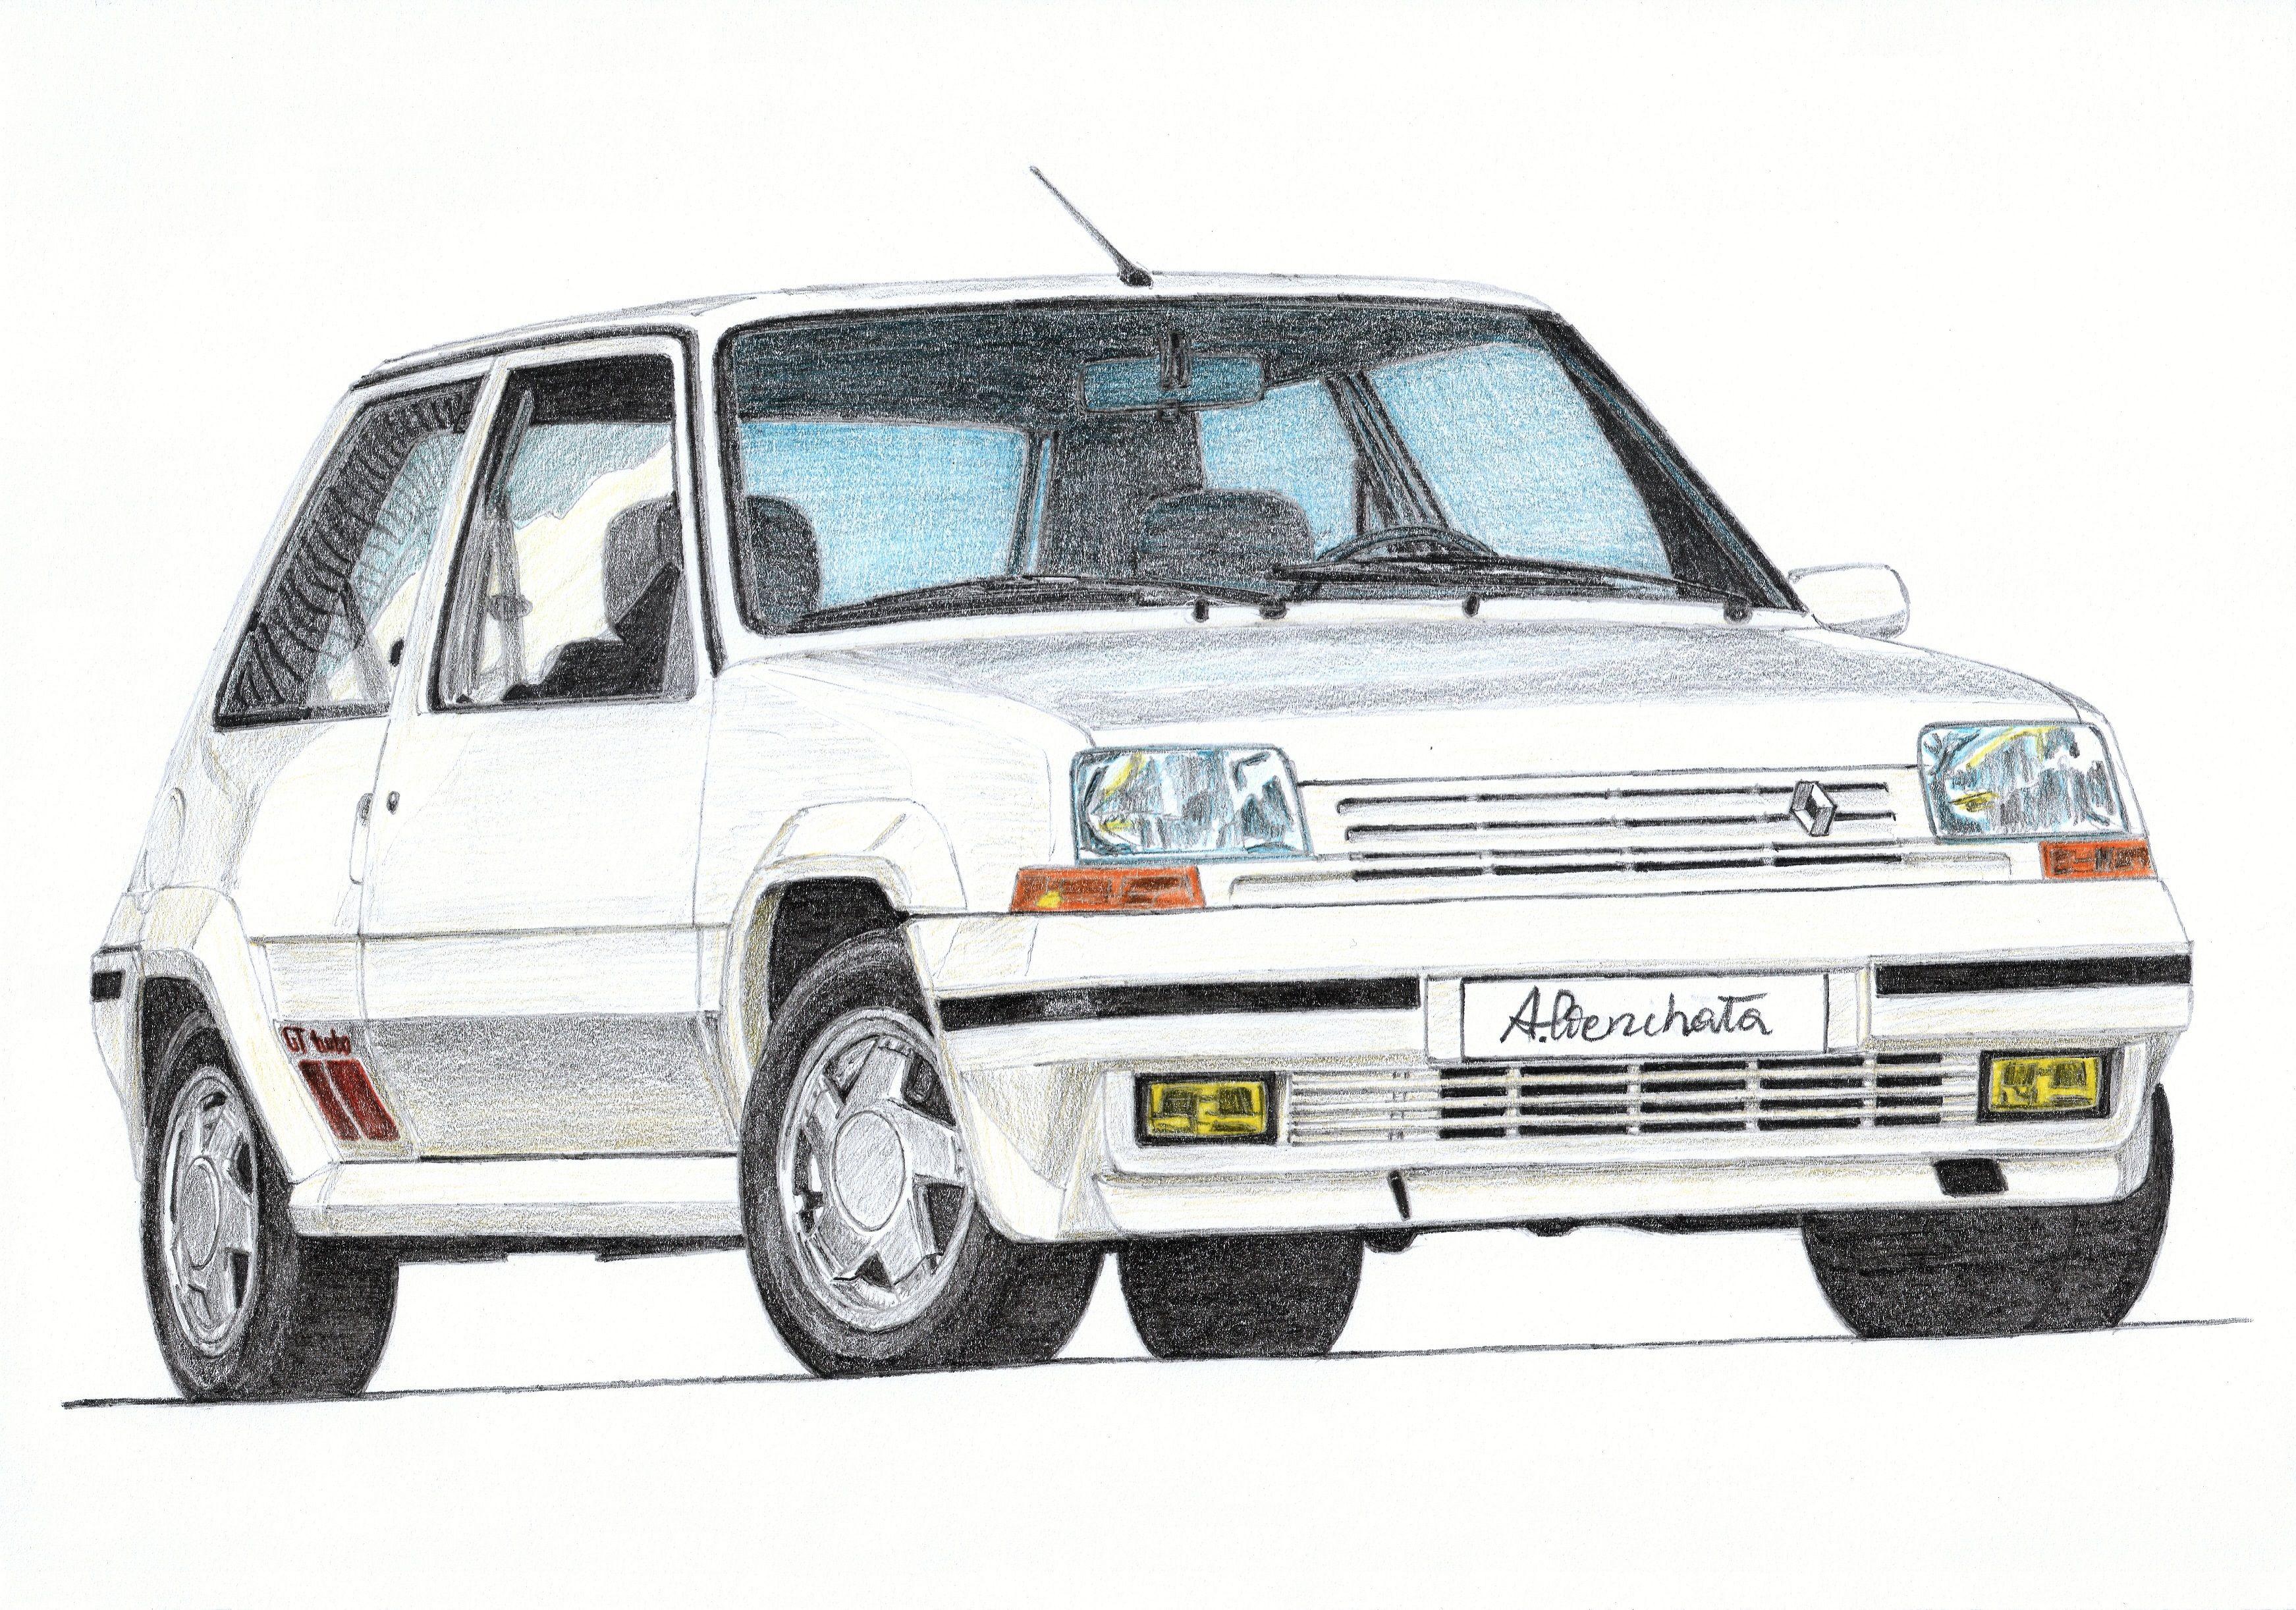 Renault 5 Gt Turbo 3 3 Renault 5 Gt Turbo Renault 5 Renault